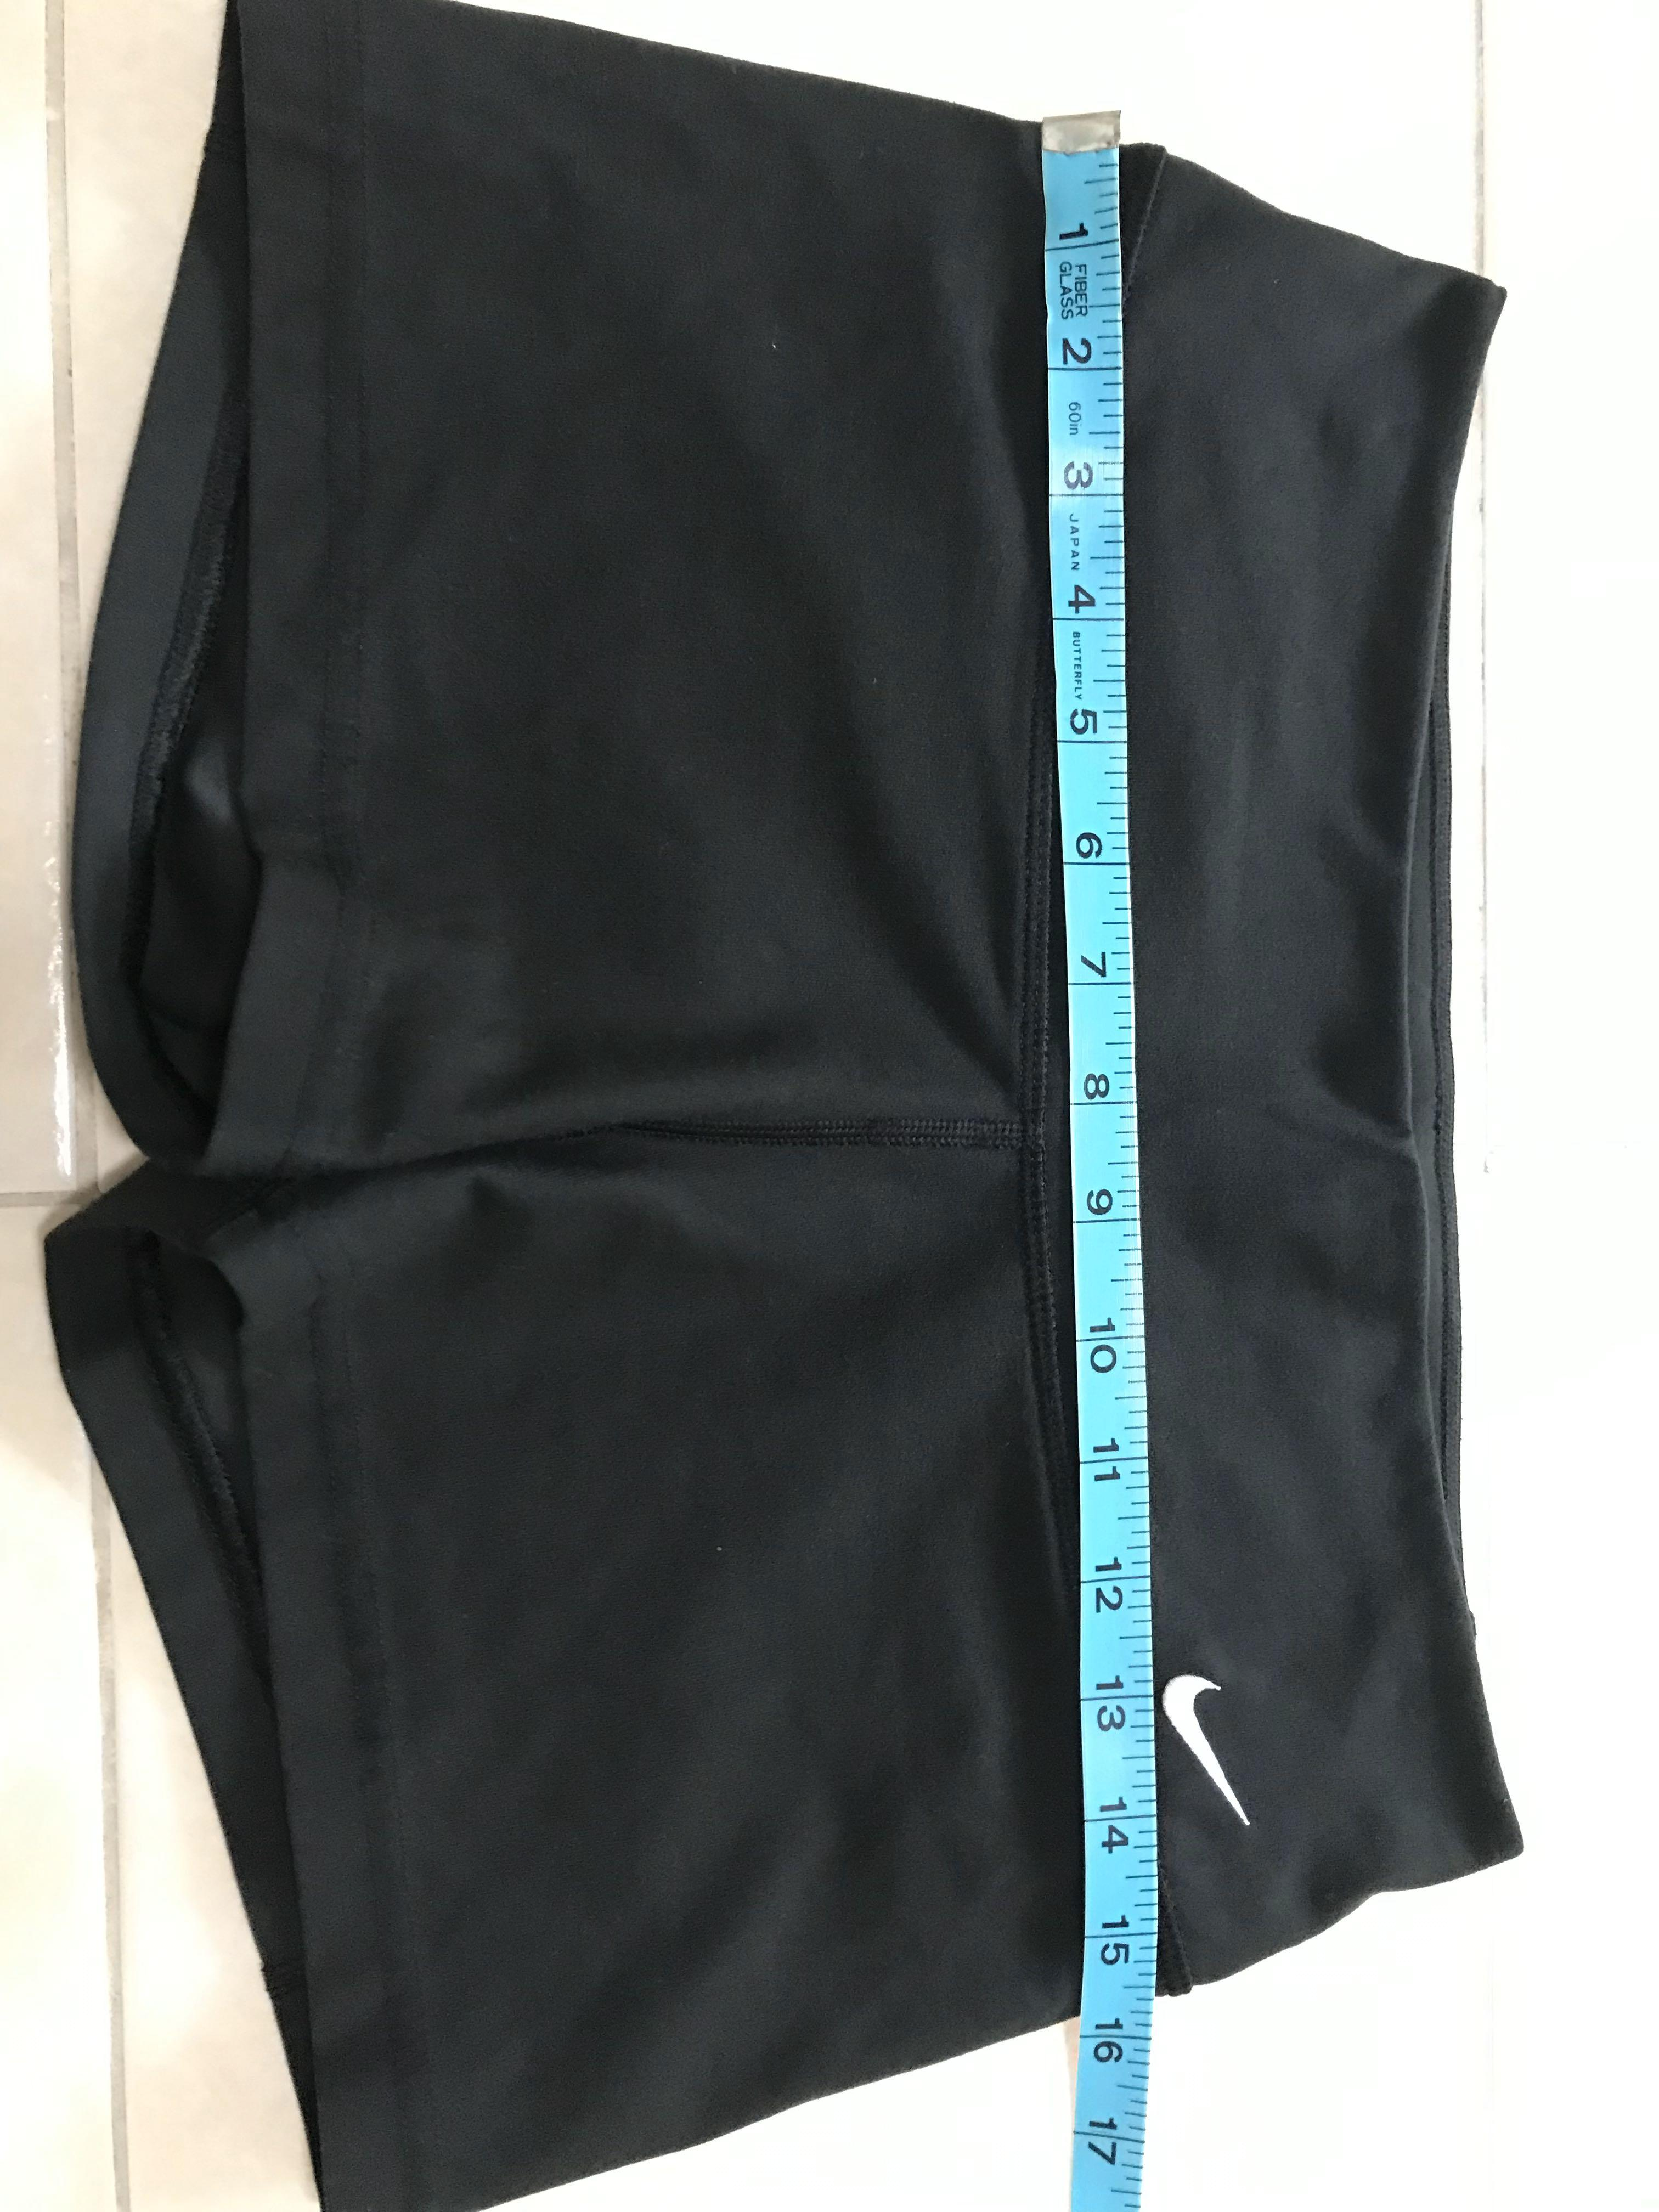 Women's Sports Tights (Shorts)